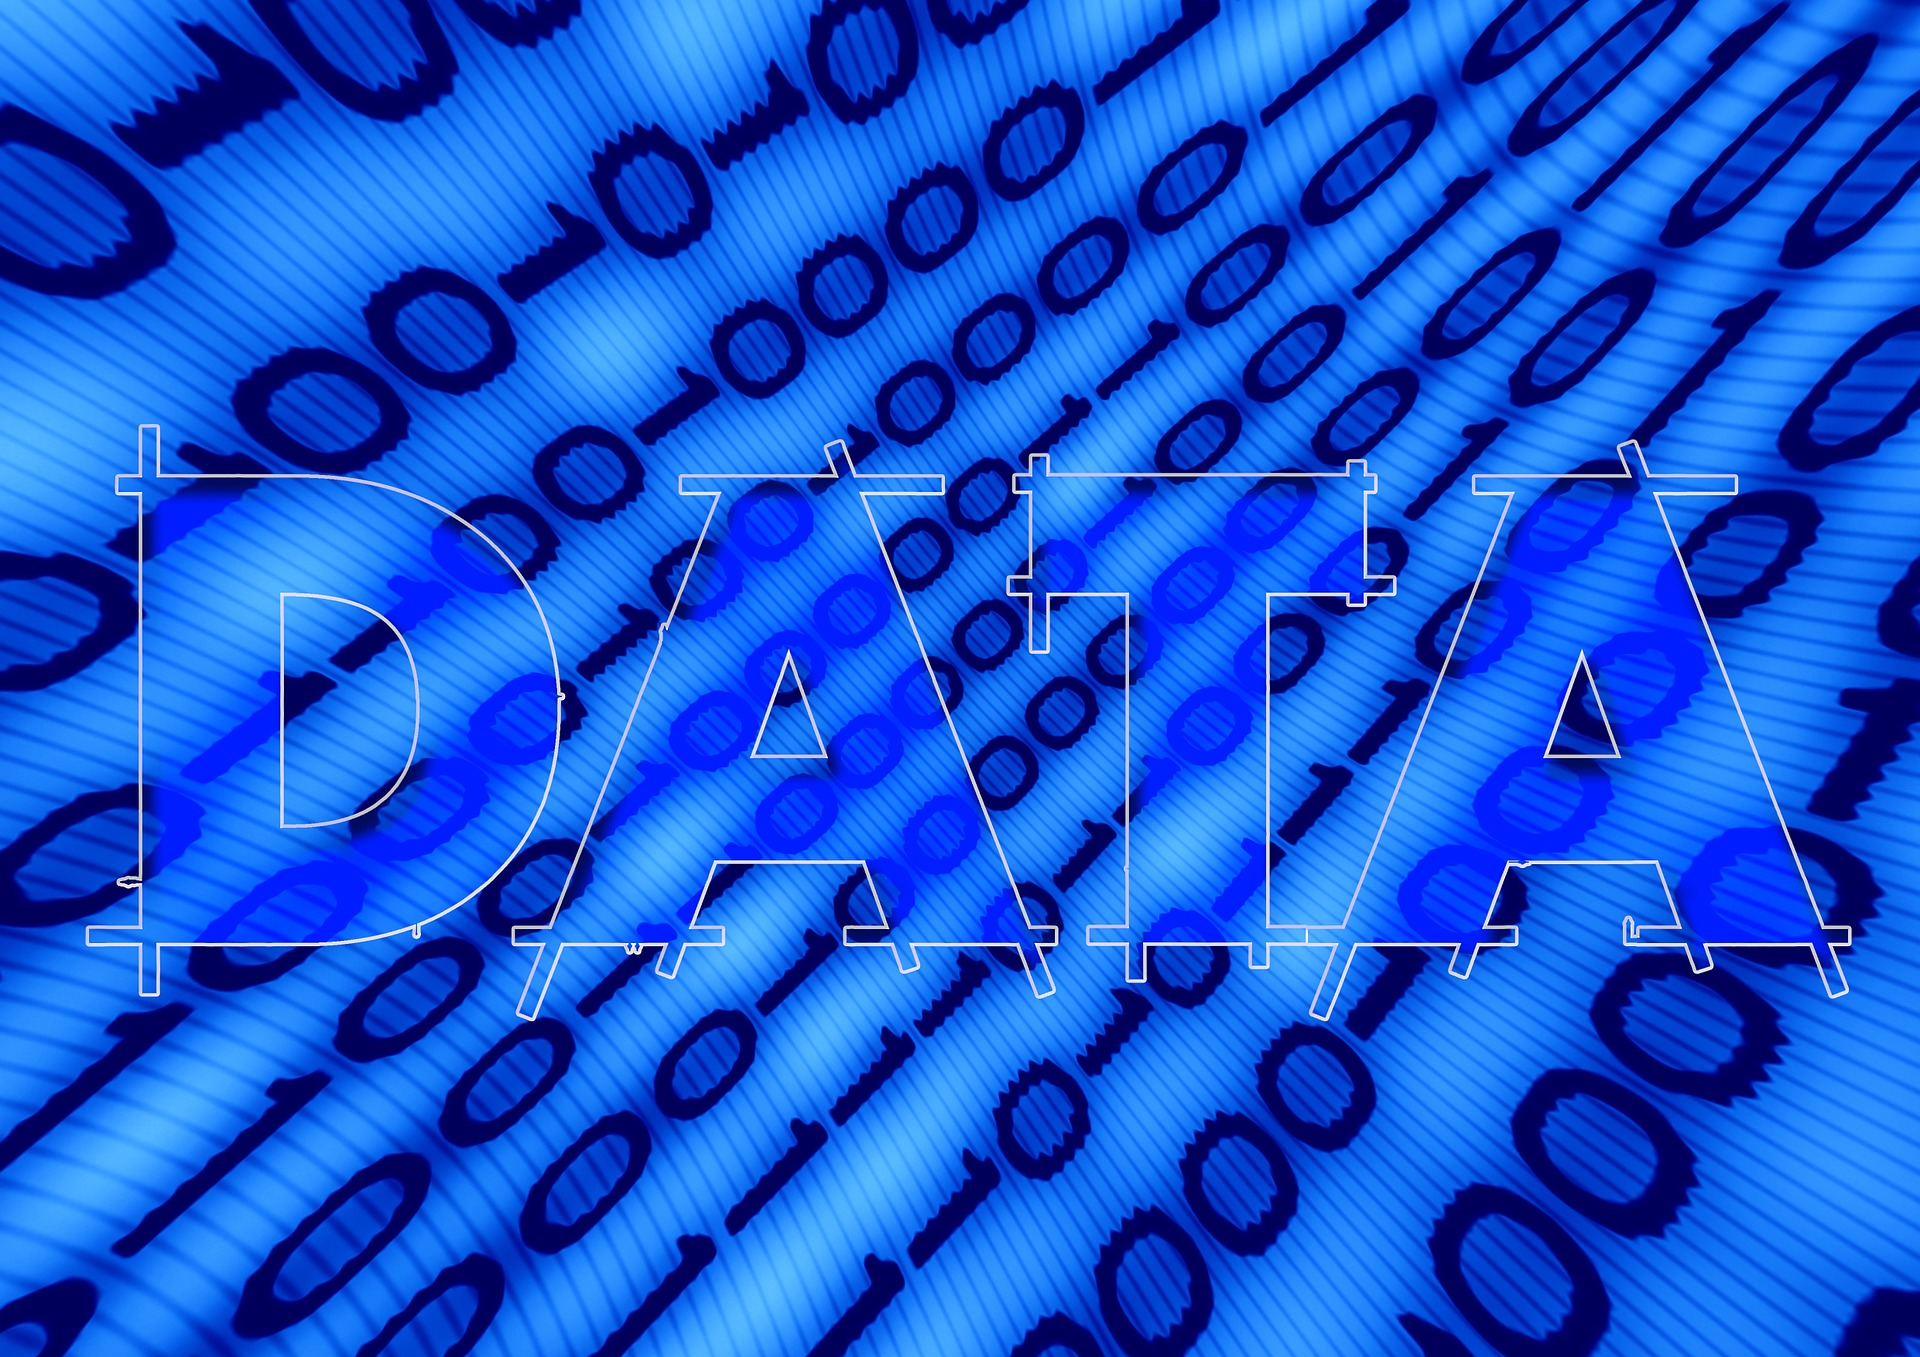 Database Systems, photo: Gerd Altmann